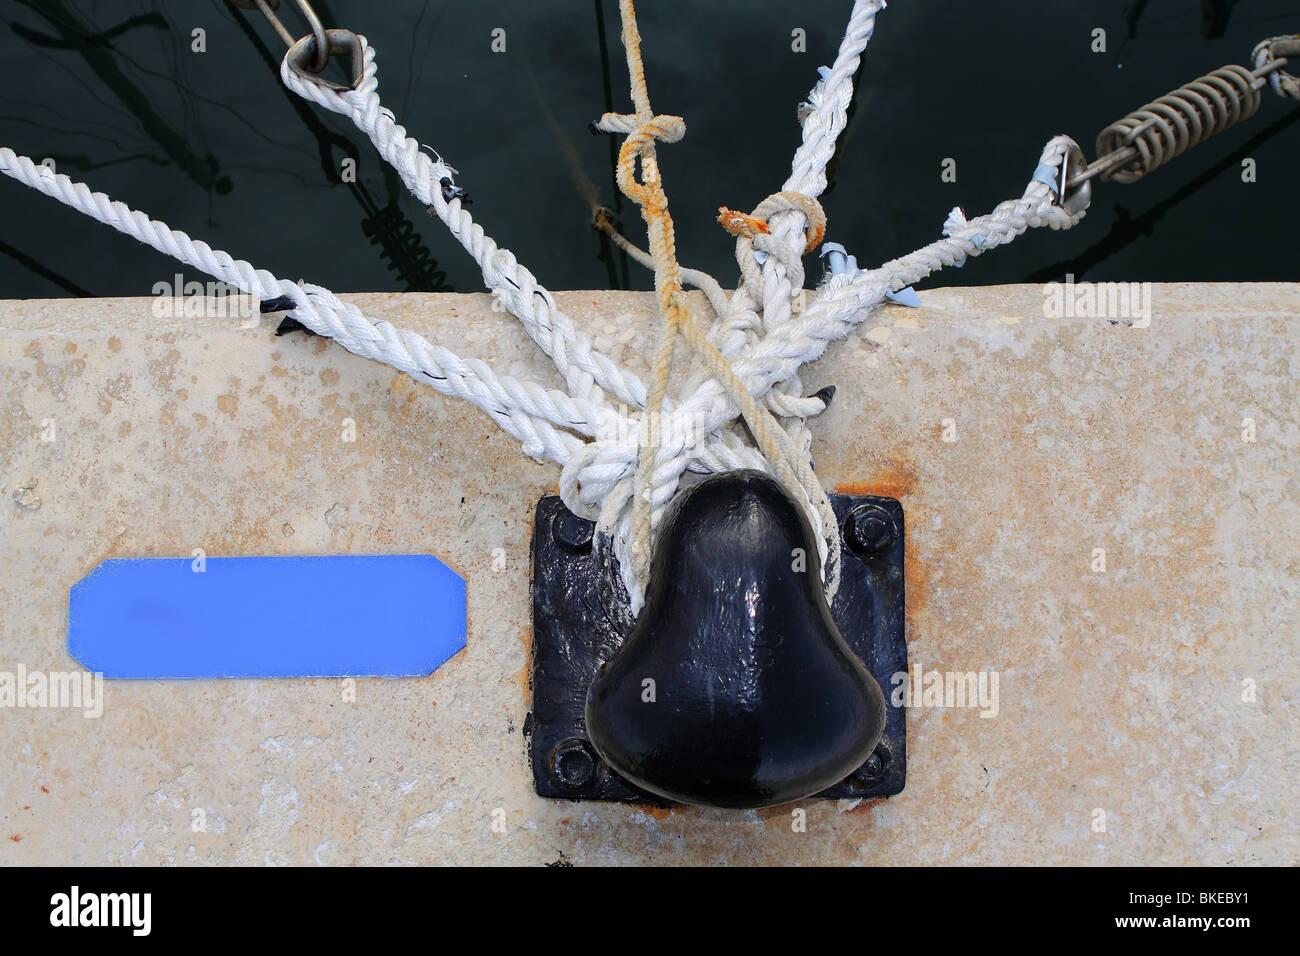 black bollard with many nautical ropes around - Stock Image